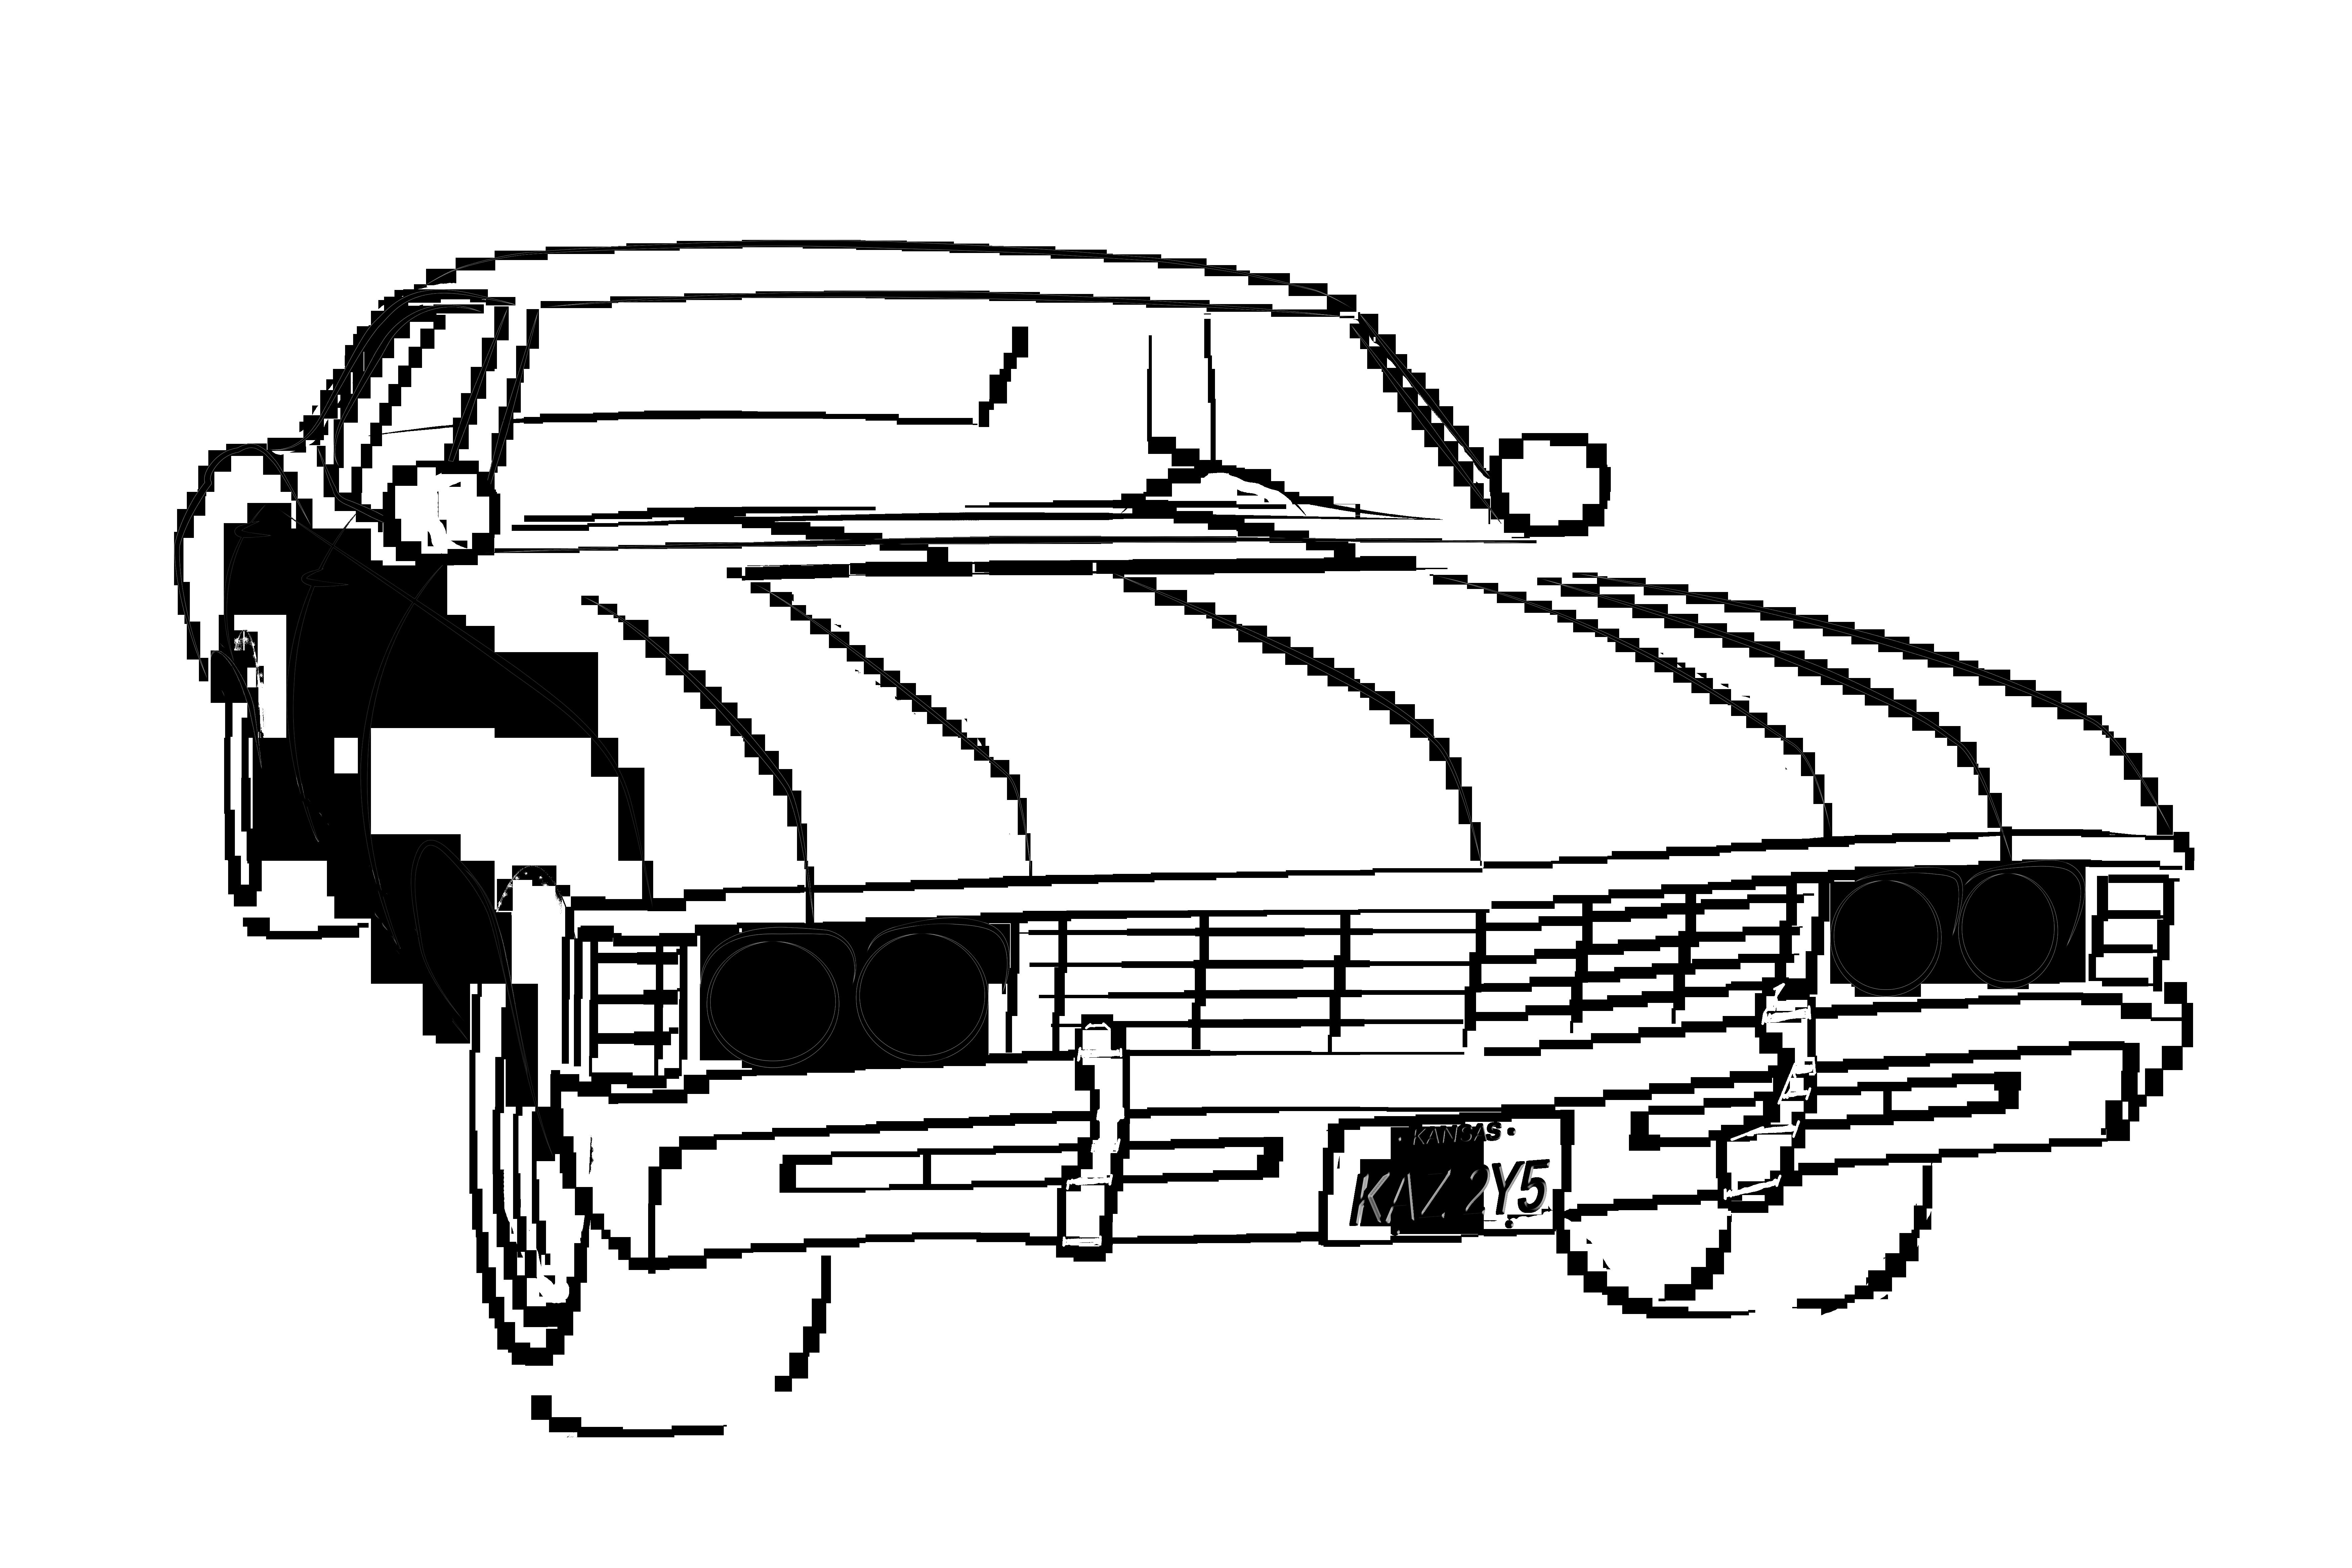 Line Art Resolution : Impala high resolution line drawing by drian on deviantart